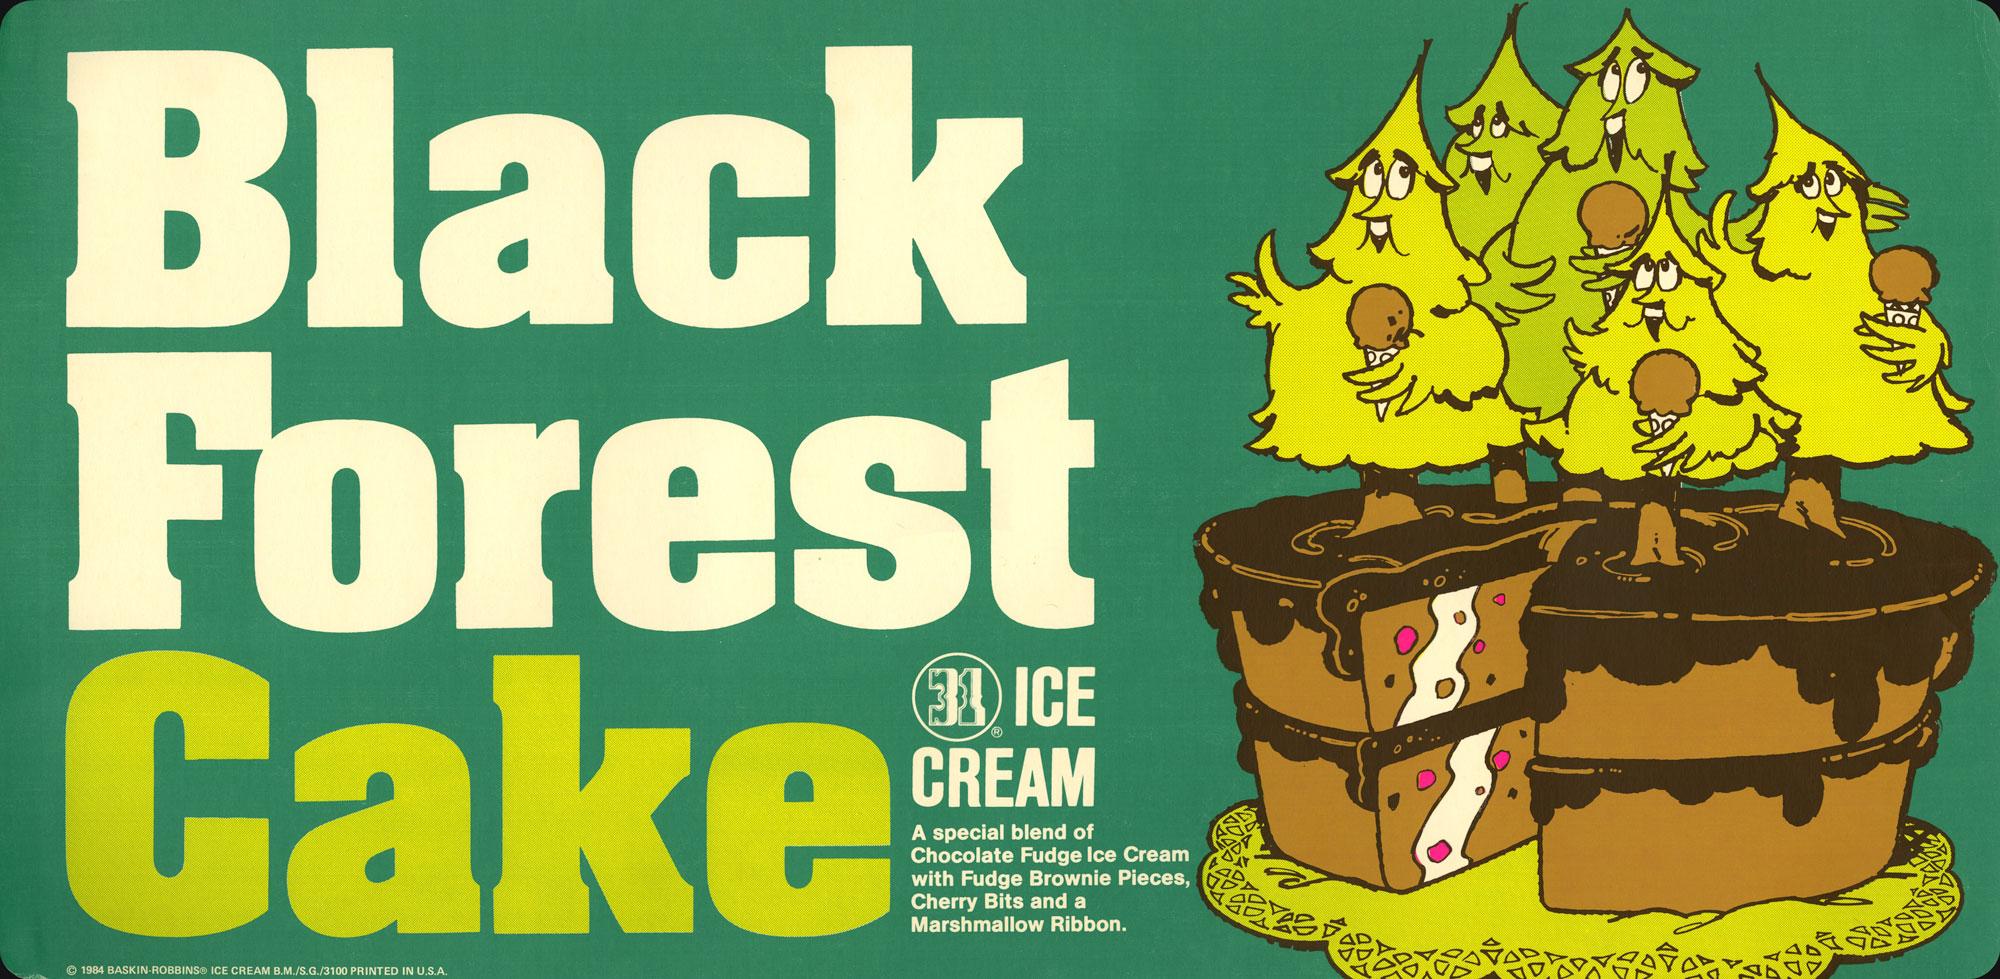 baskin-robbins-master-black-forest-cake.jpg